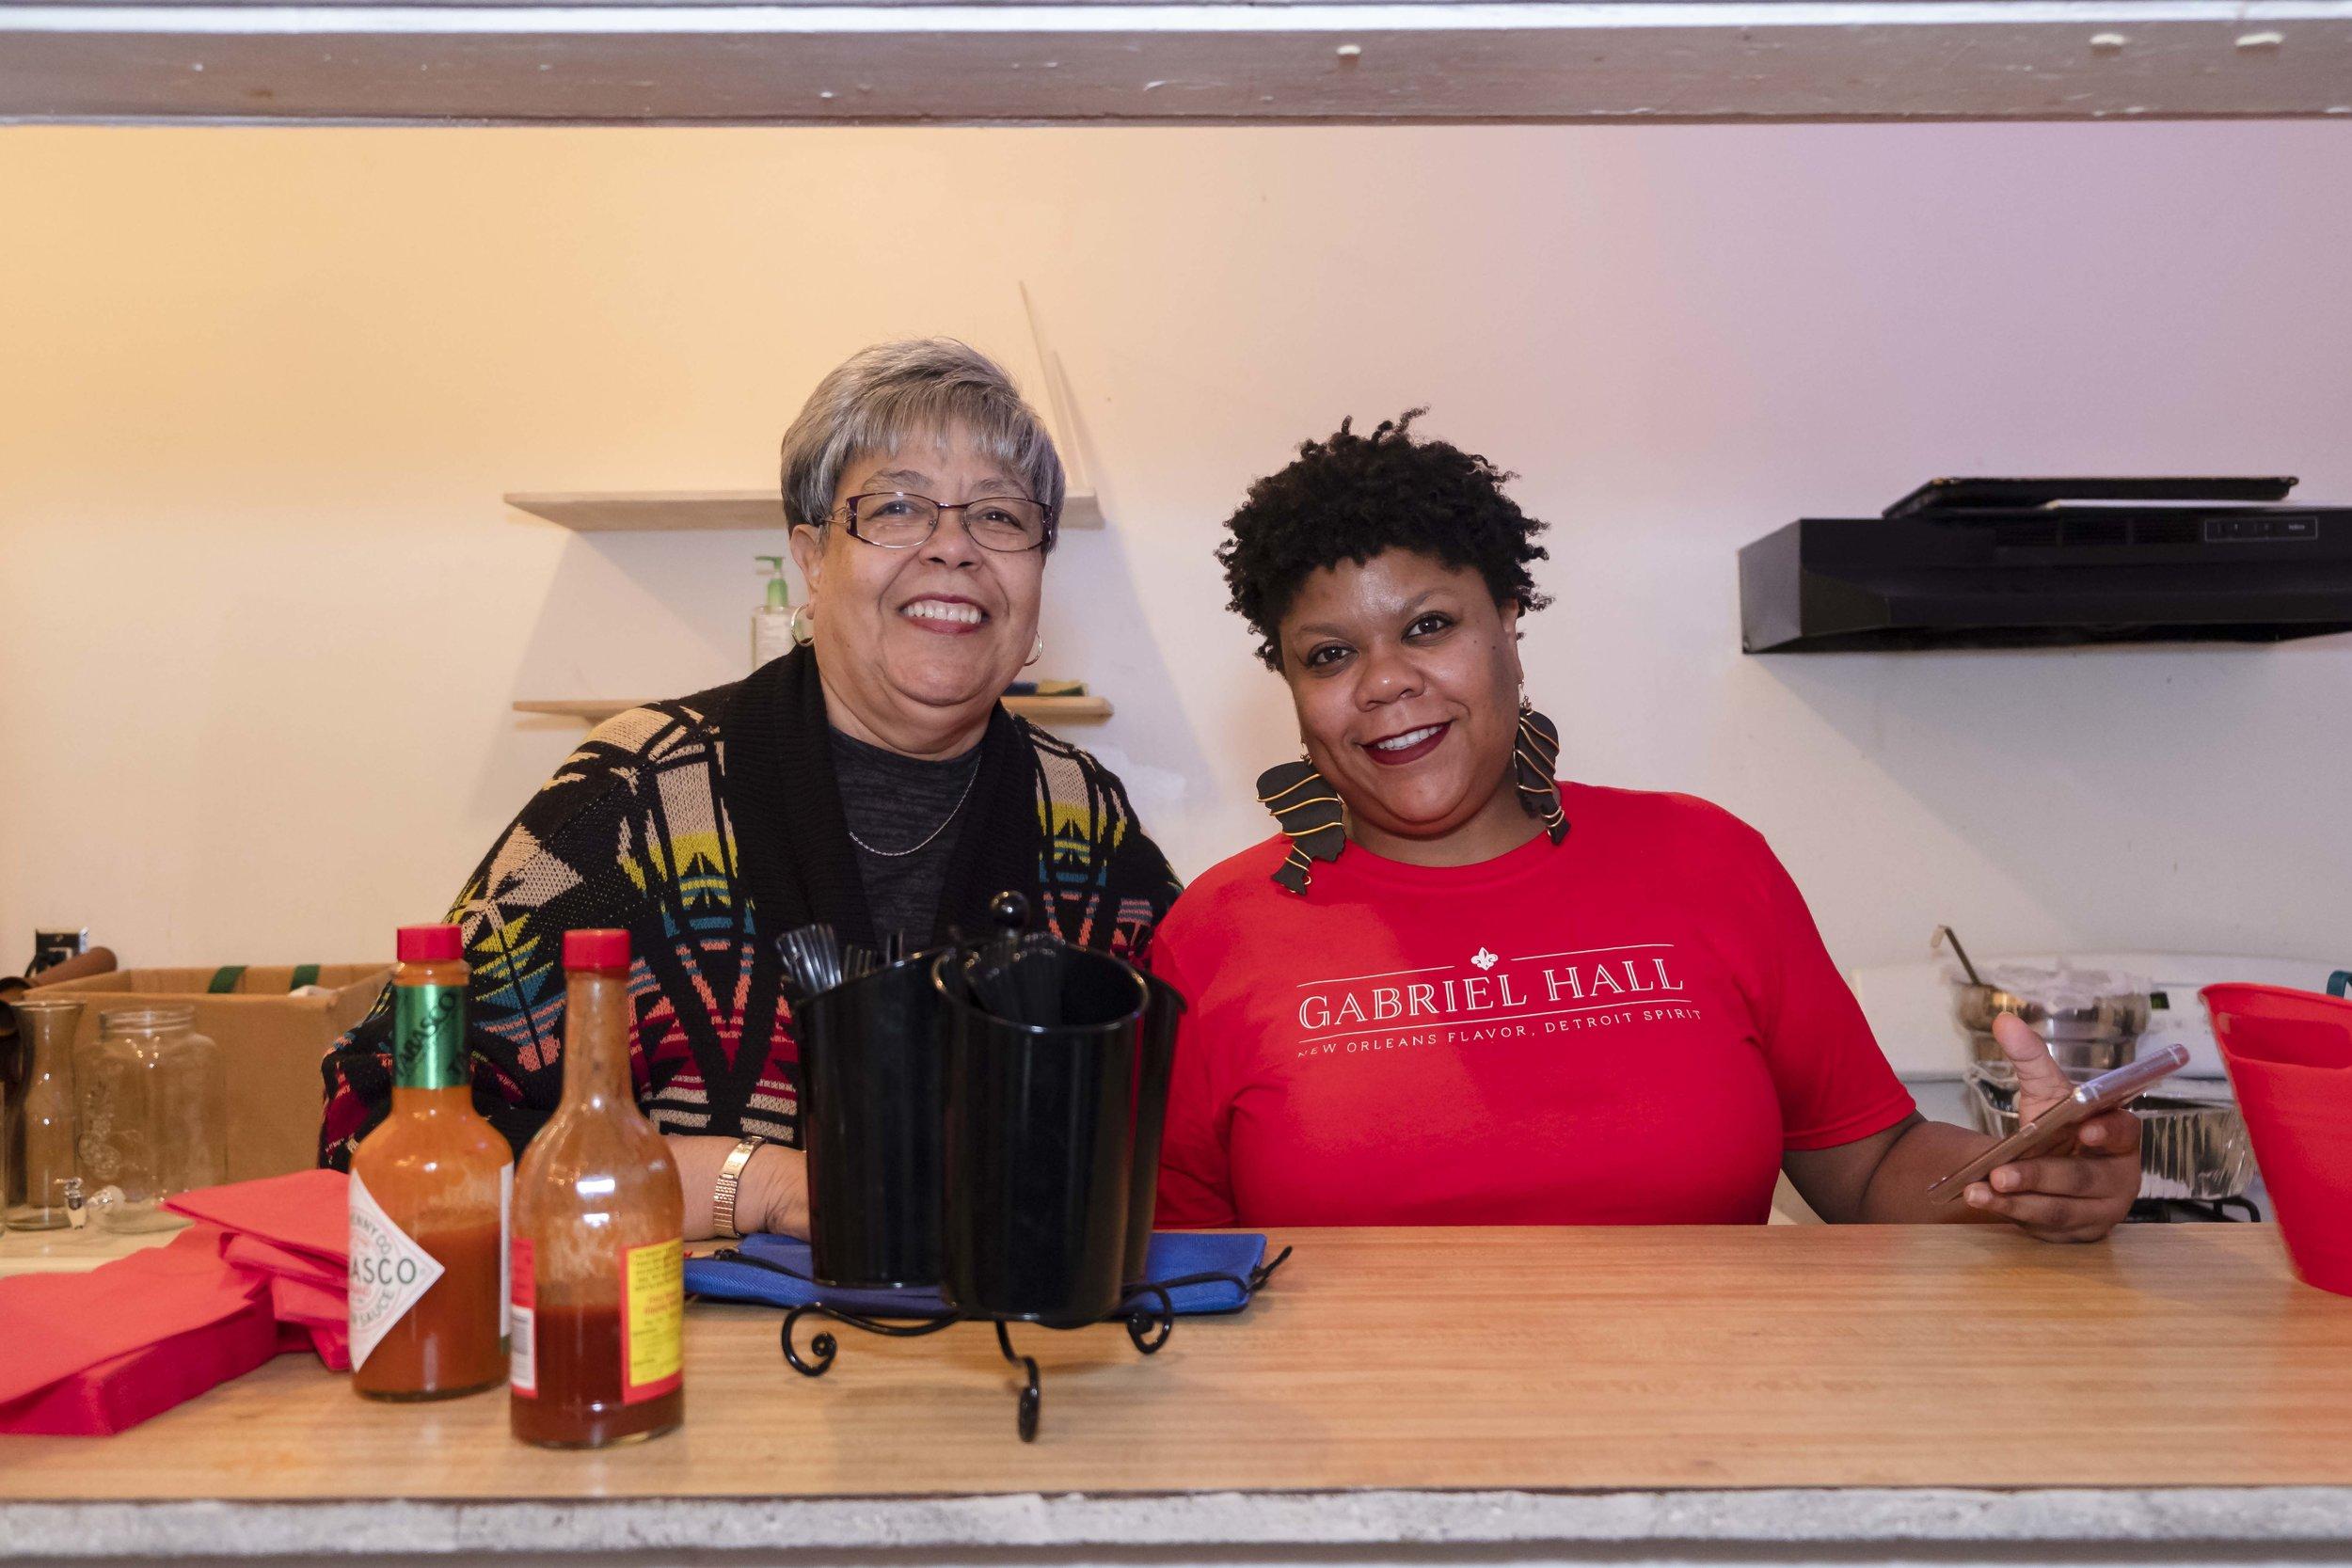 Chef Ederique of Gabriel Hall    |  Louisiana Cuisine & More!